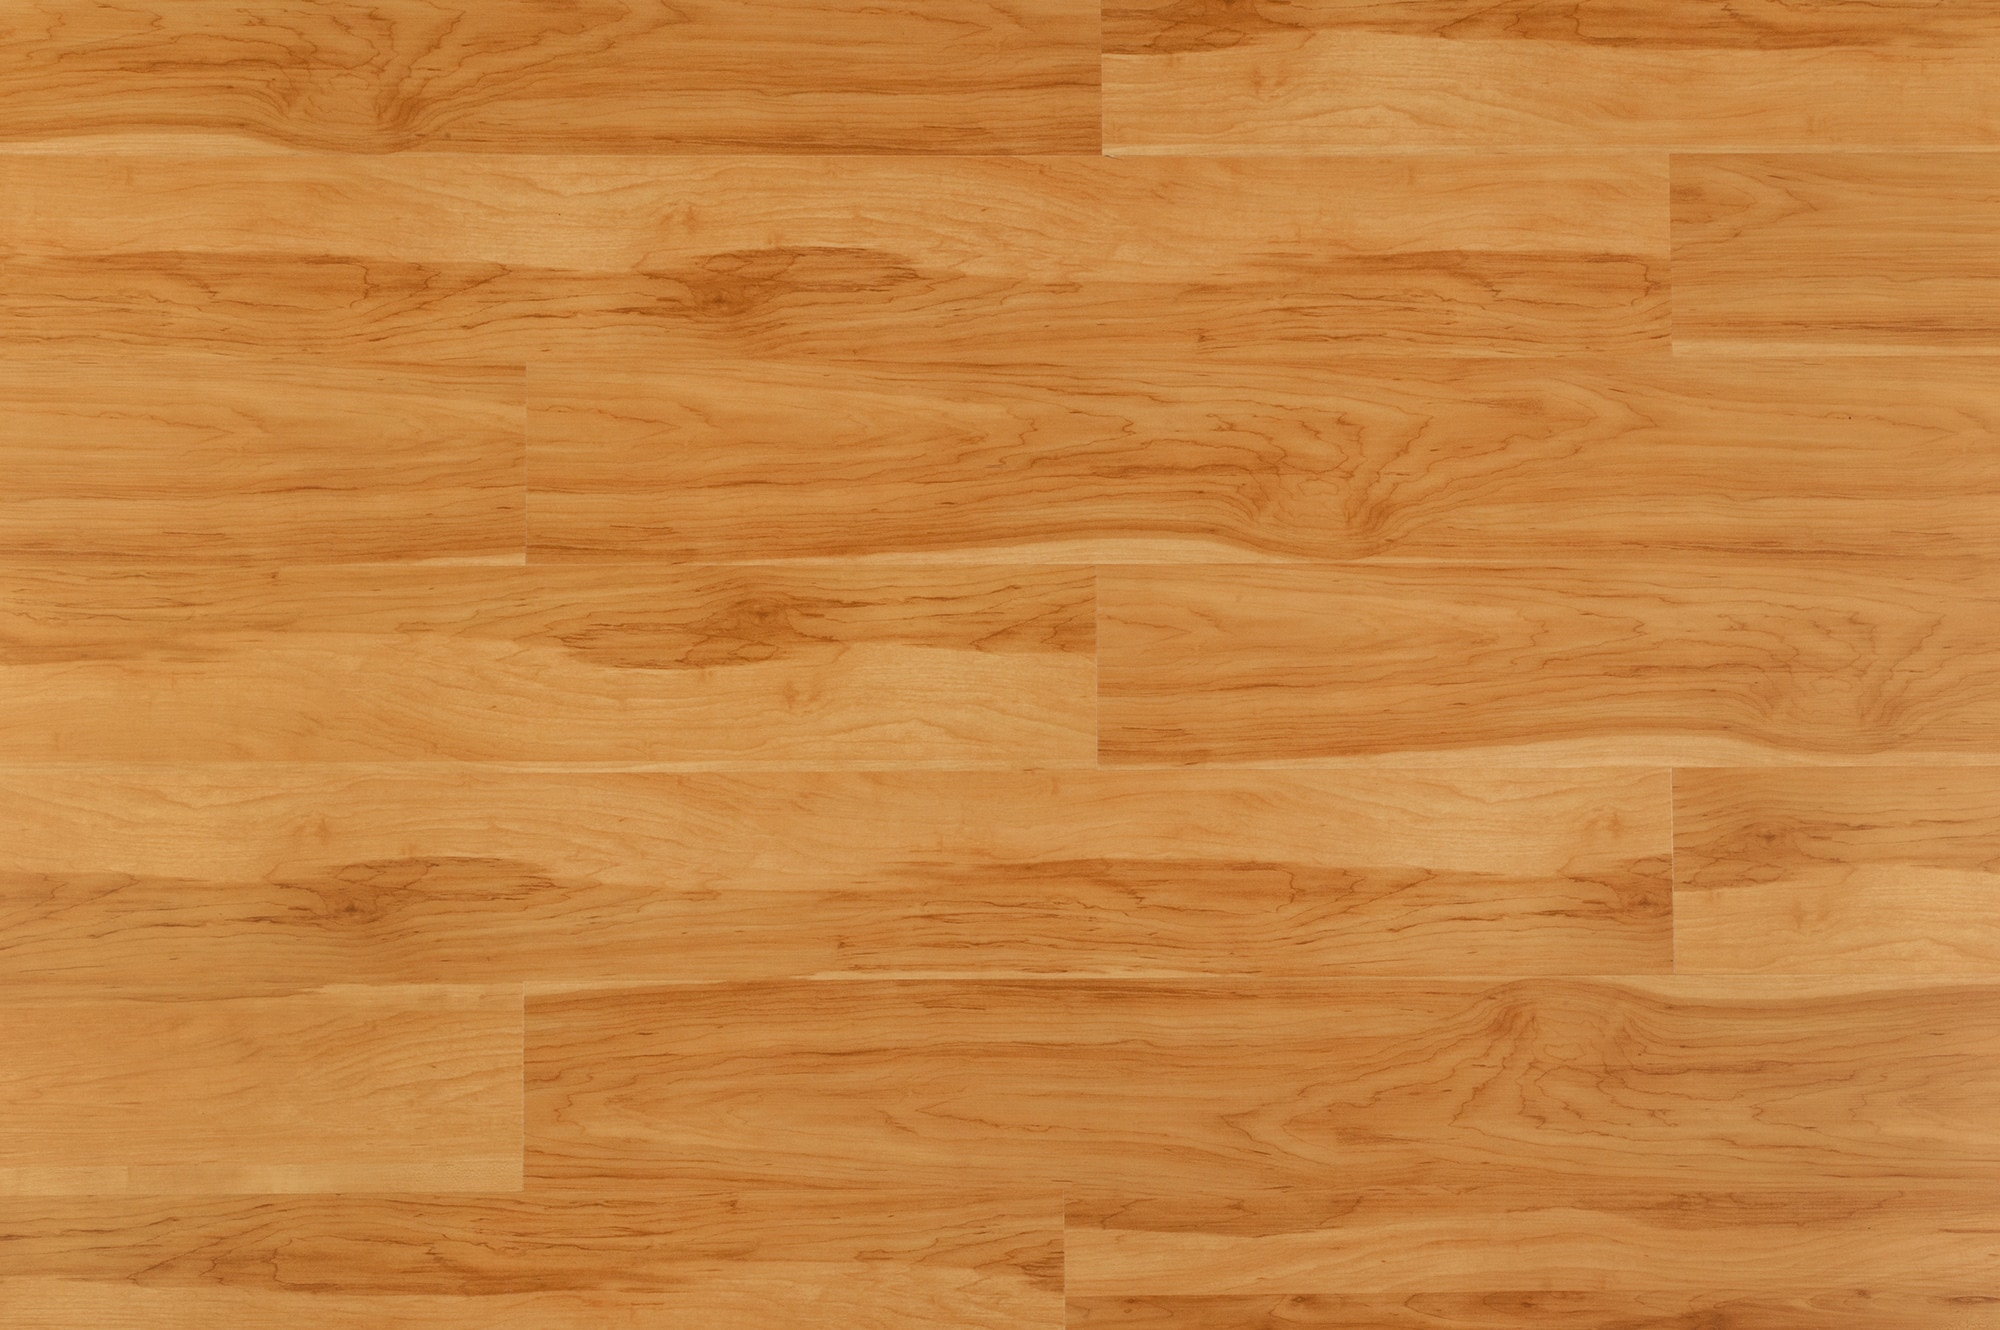 FREE Samples Vesdura Vinyl Planks